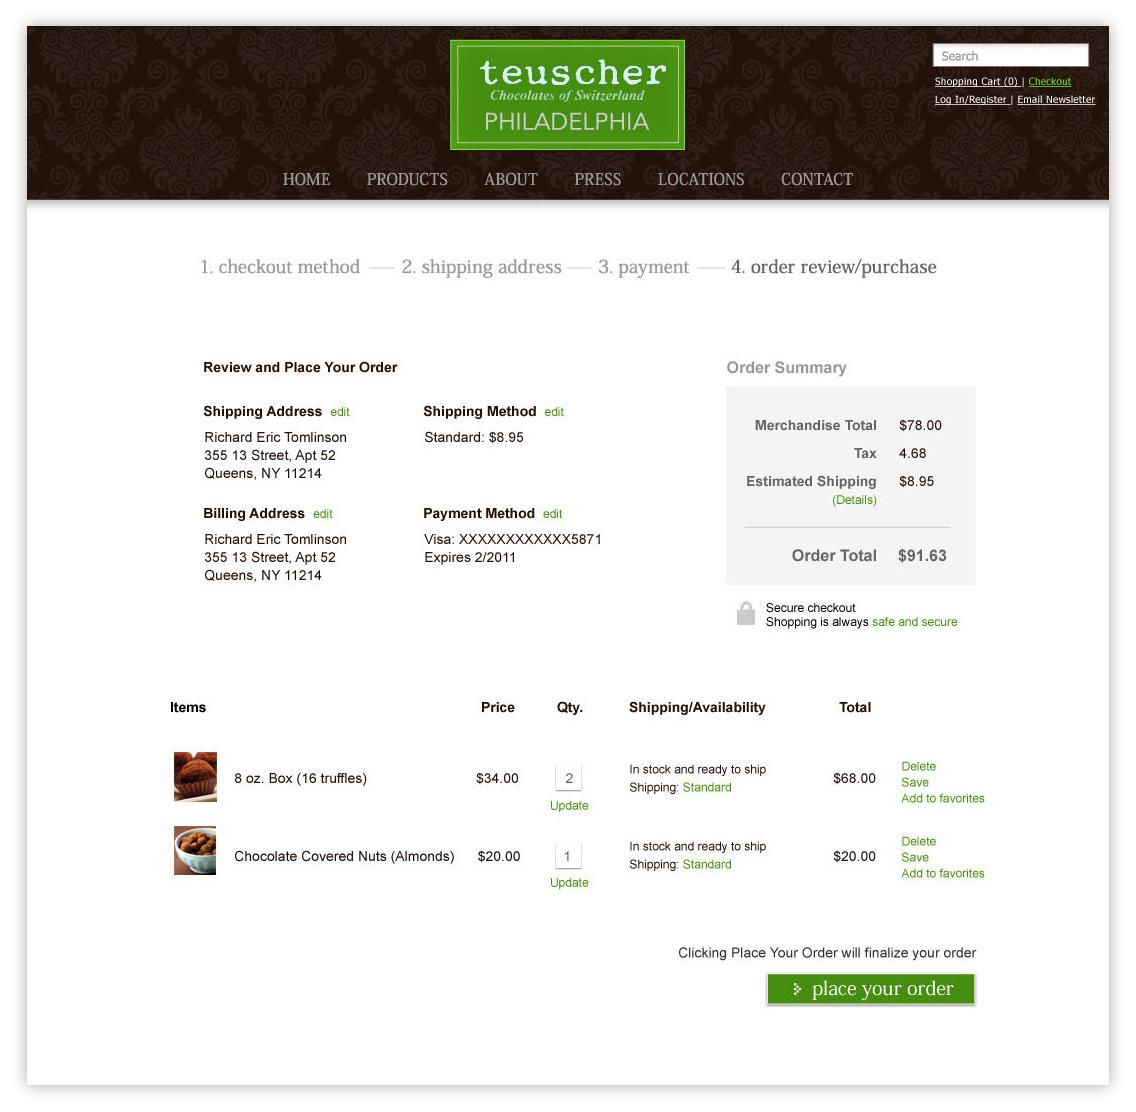 Teuscher_0008_Checkout---review-_-purchase.jpg